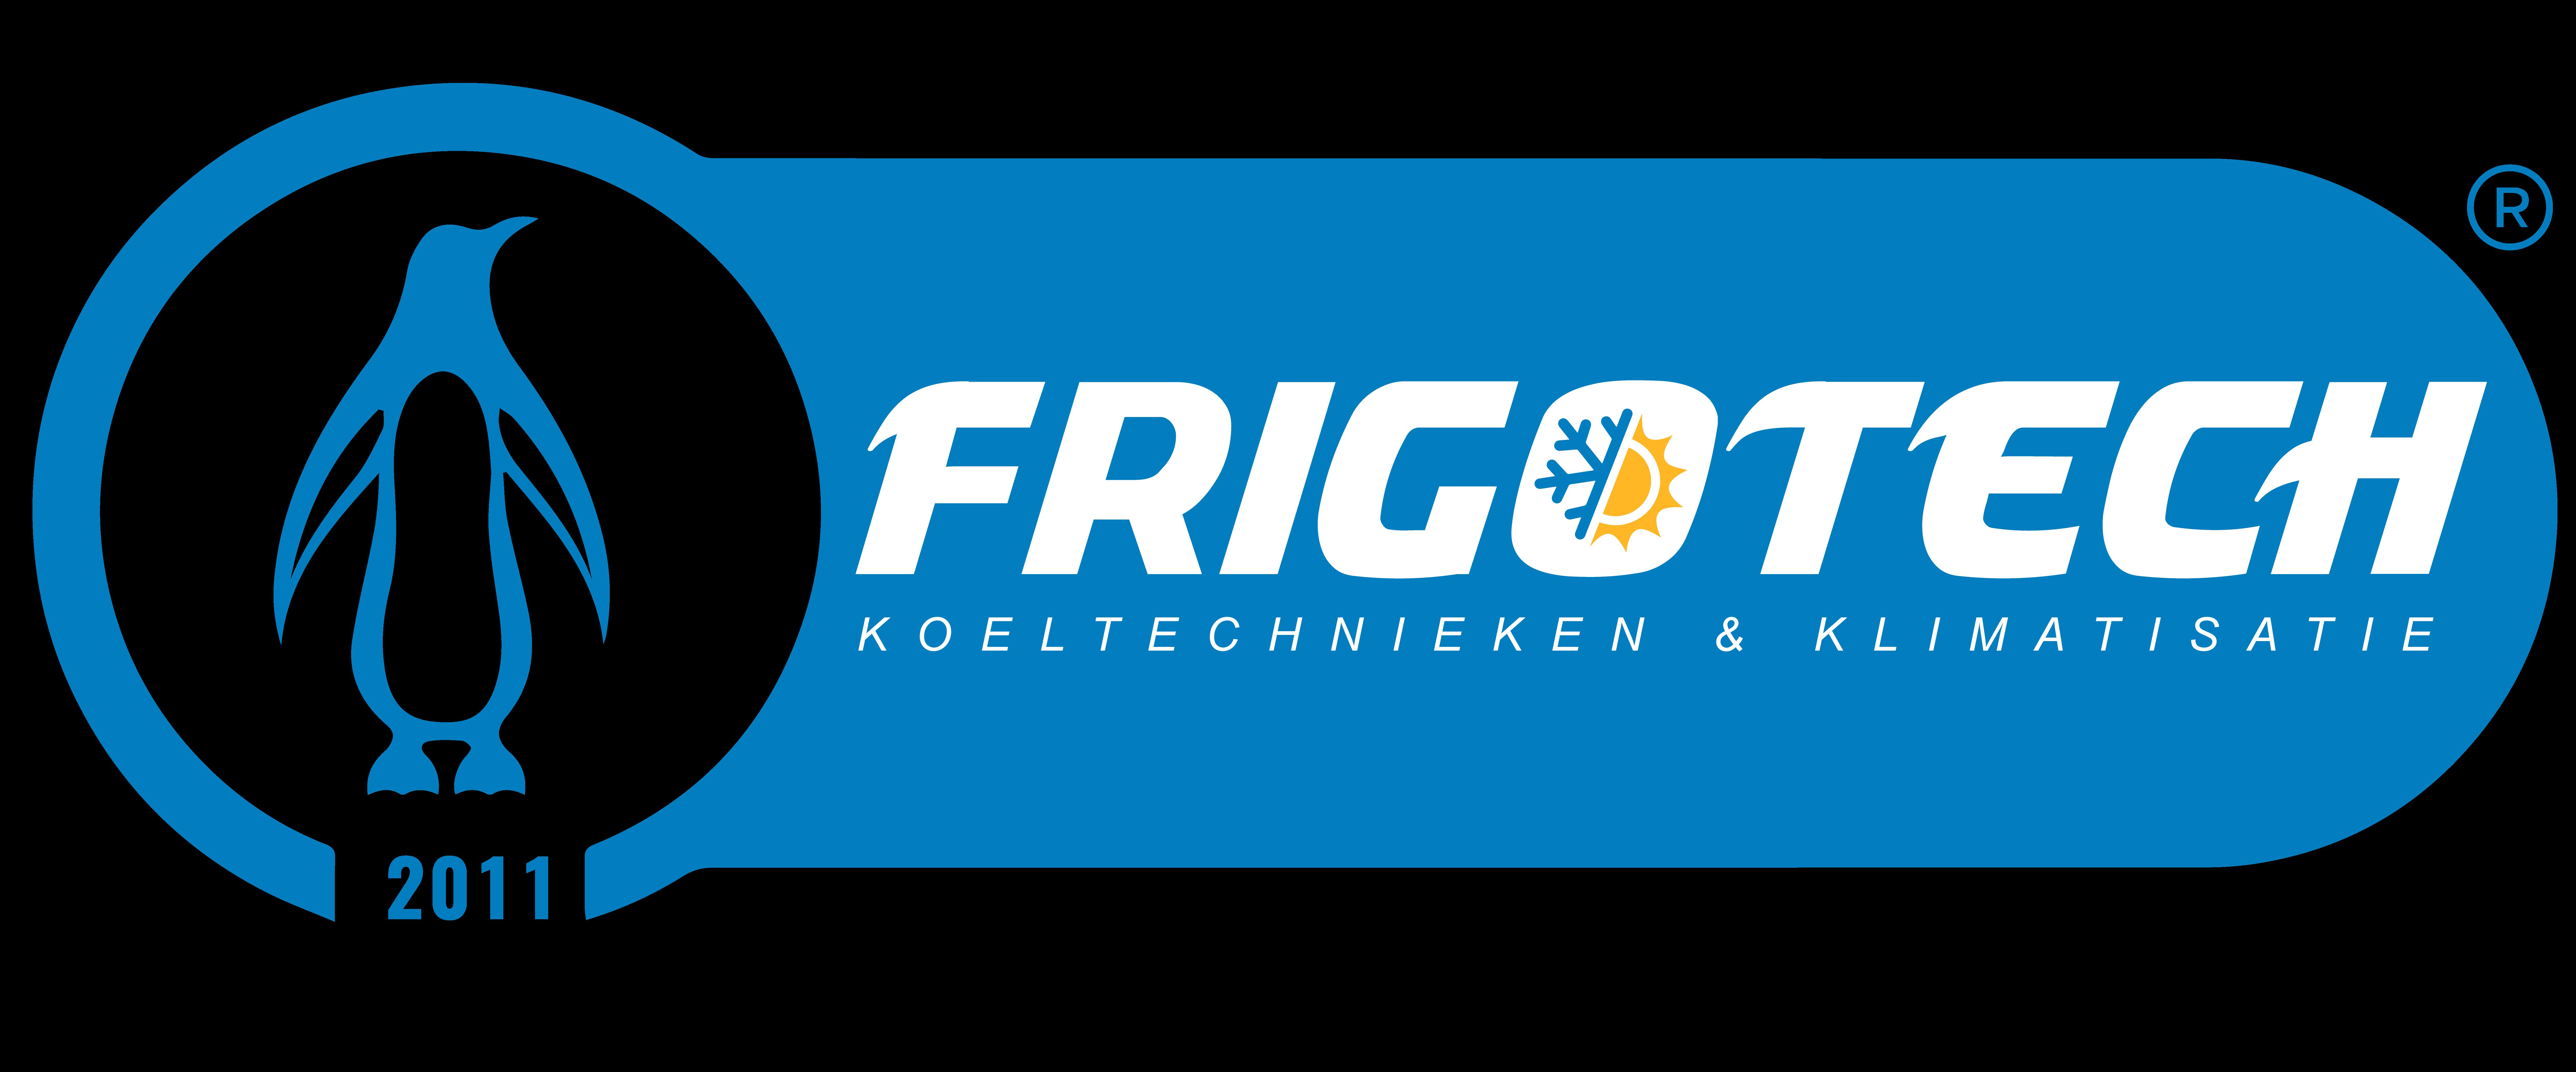 frigotech logo@10x